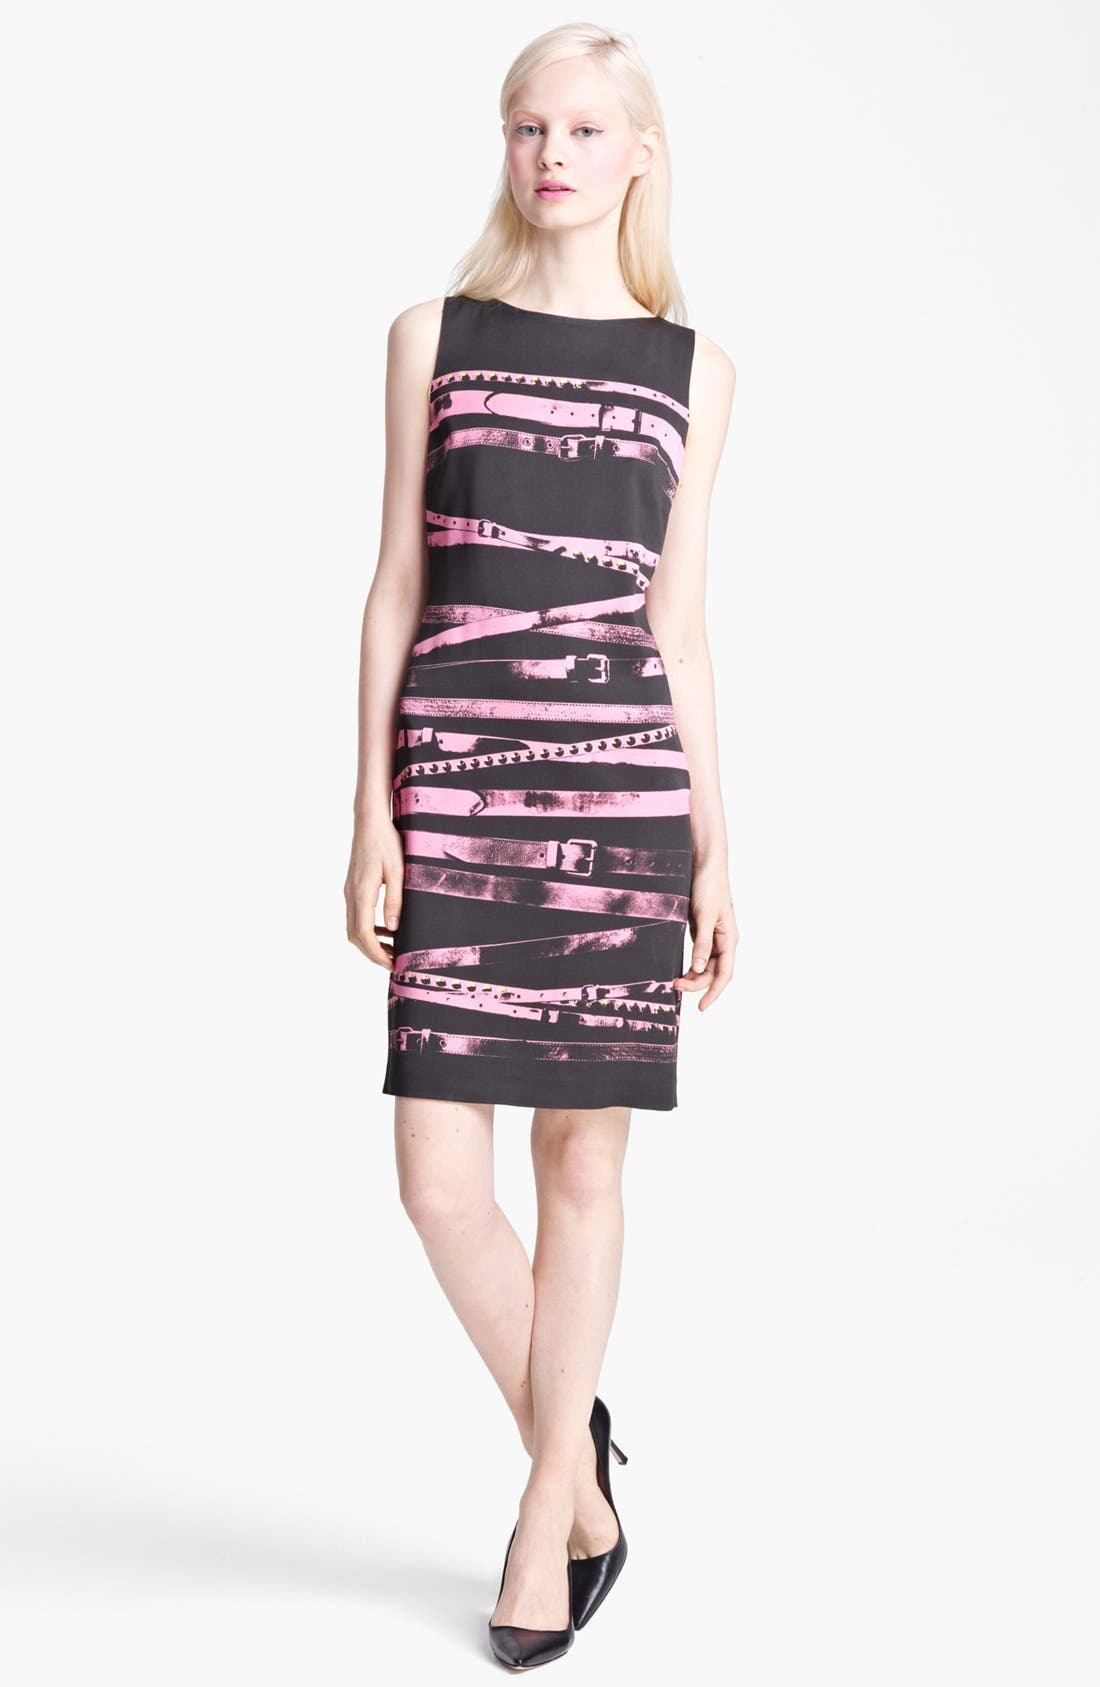 Alternate Image 1 Selected - Moschino Cheap & Chic Sleeveless Belt Print Dress